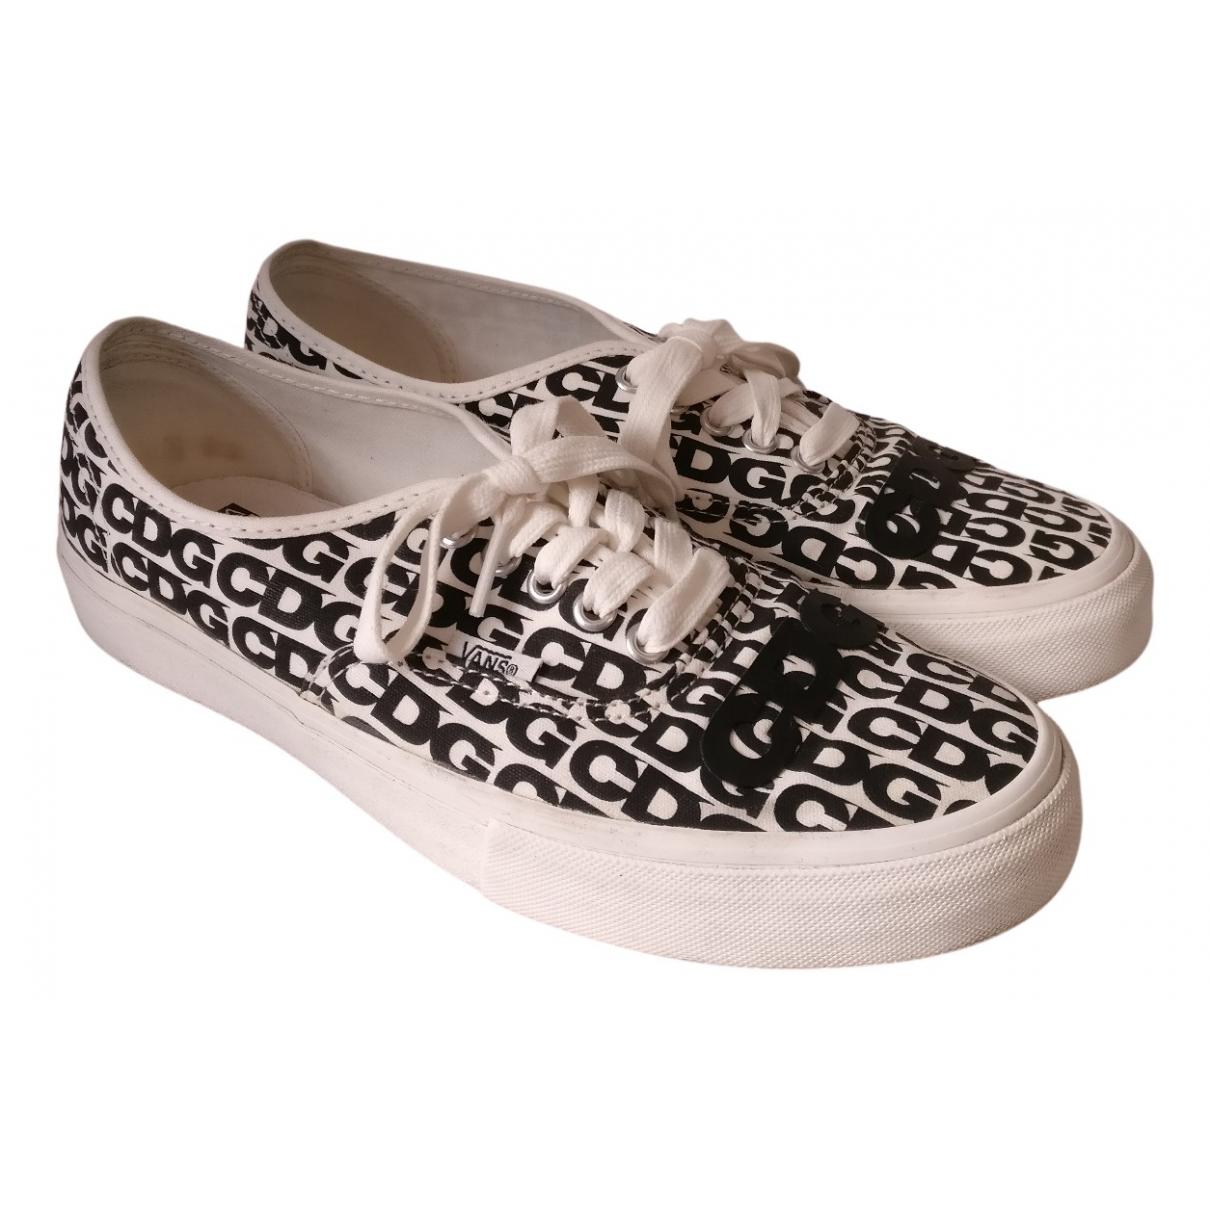 Comme Des Garcons \N Sneakers in  Weiss Leinen